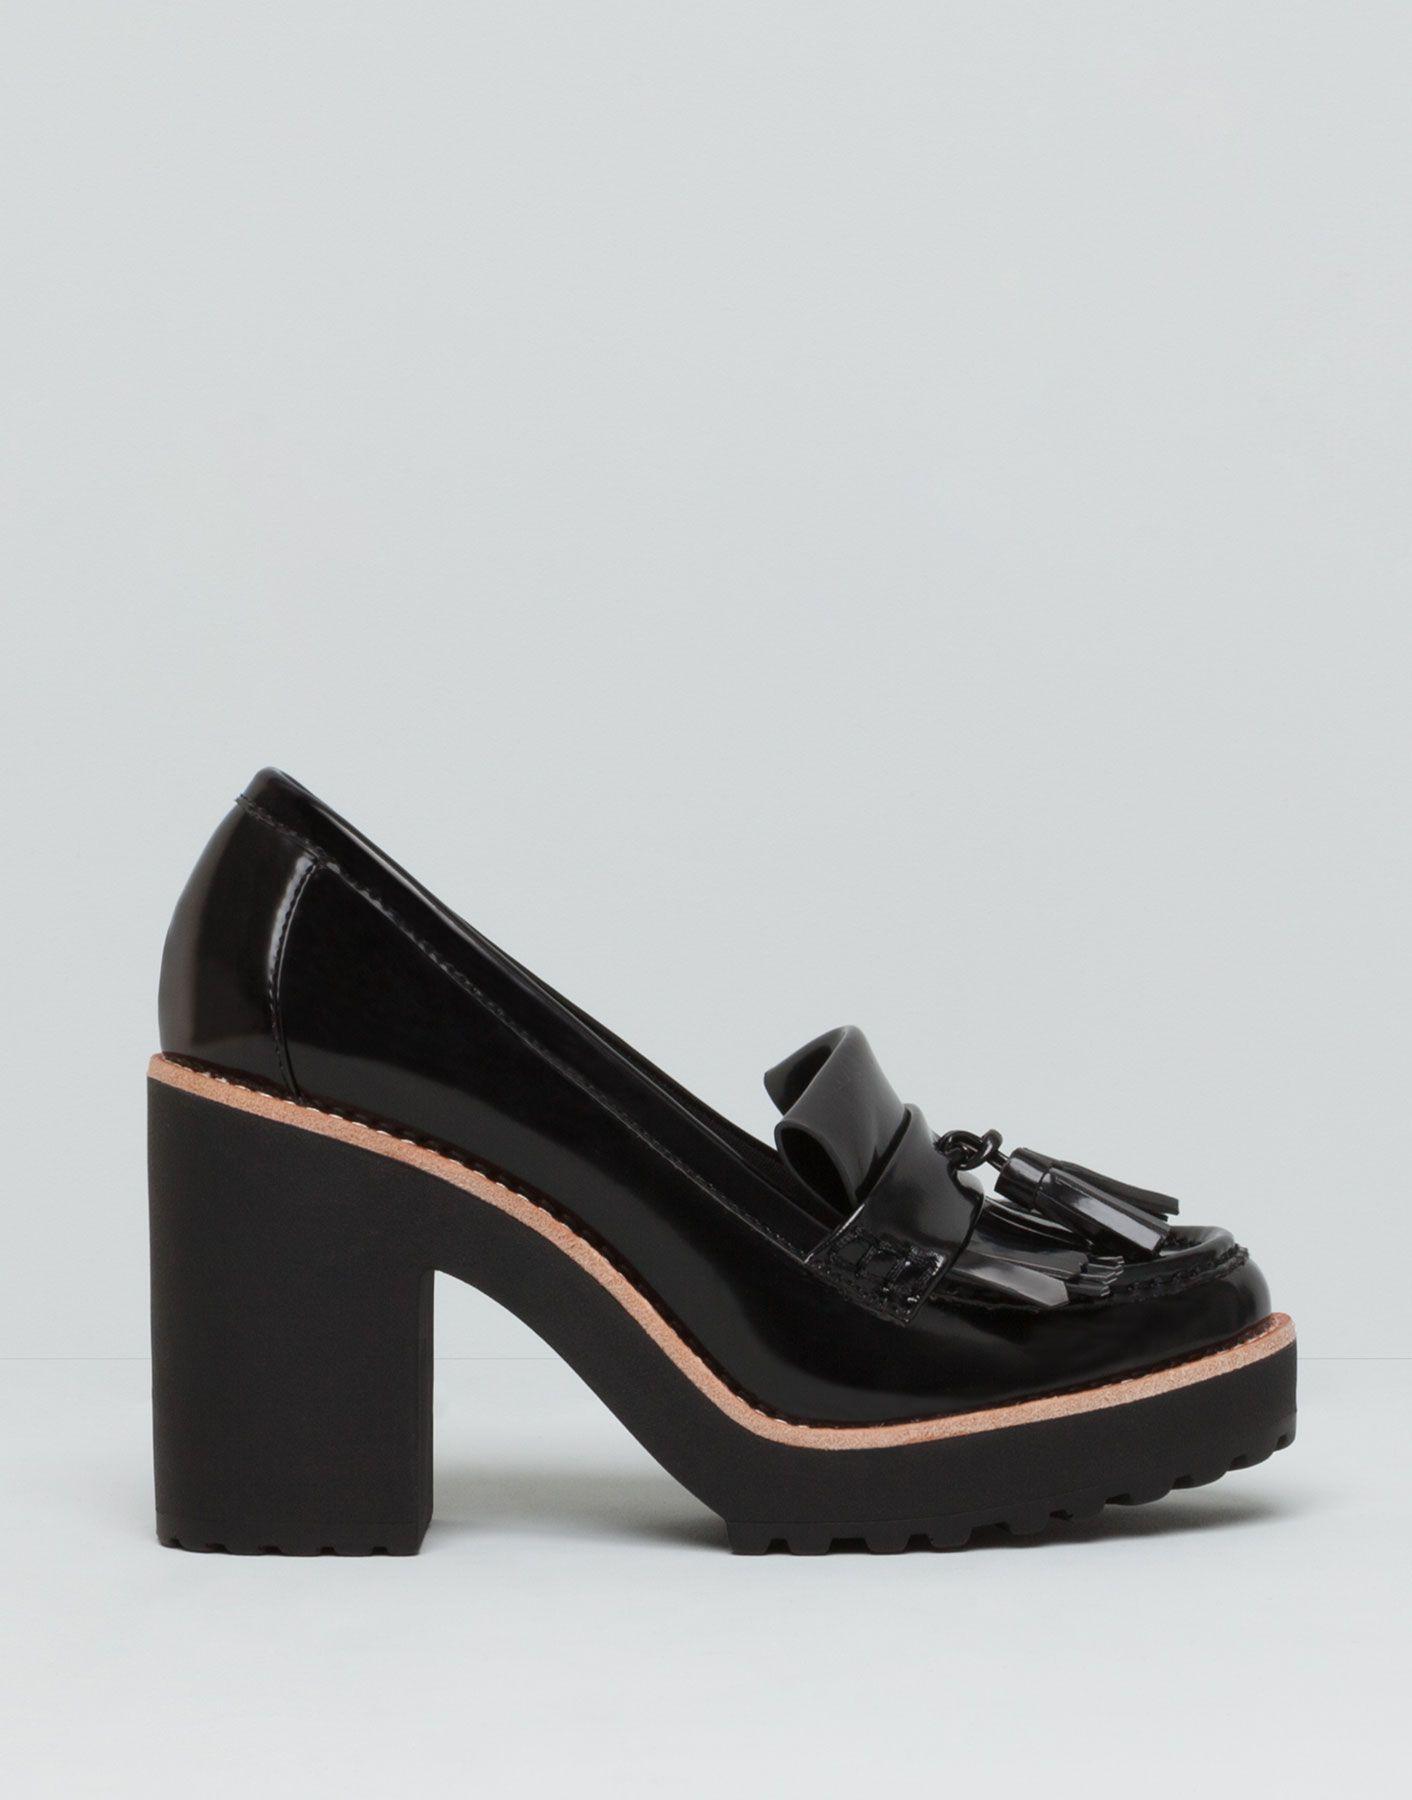 mocassins talon mode pinterest mocassin talons et chaussures de luxe. Black Bedroom Furniture Sets. Home Design Ideas